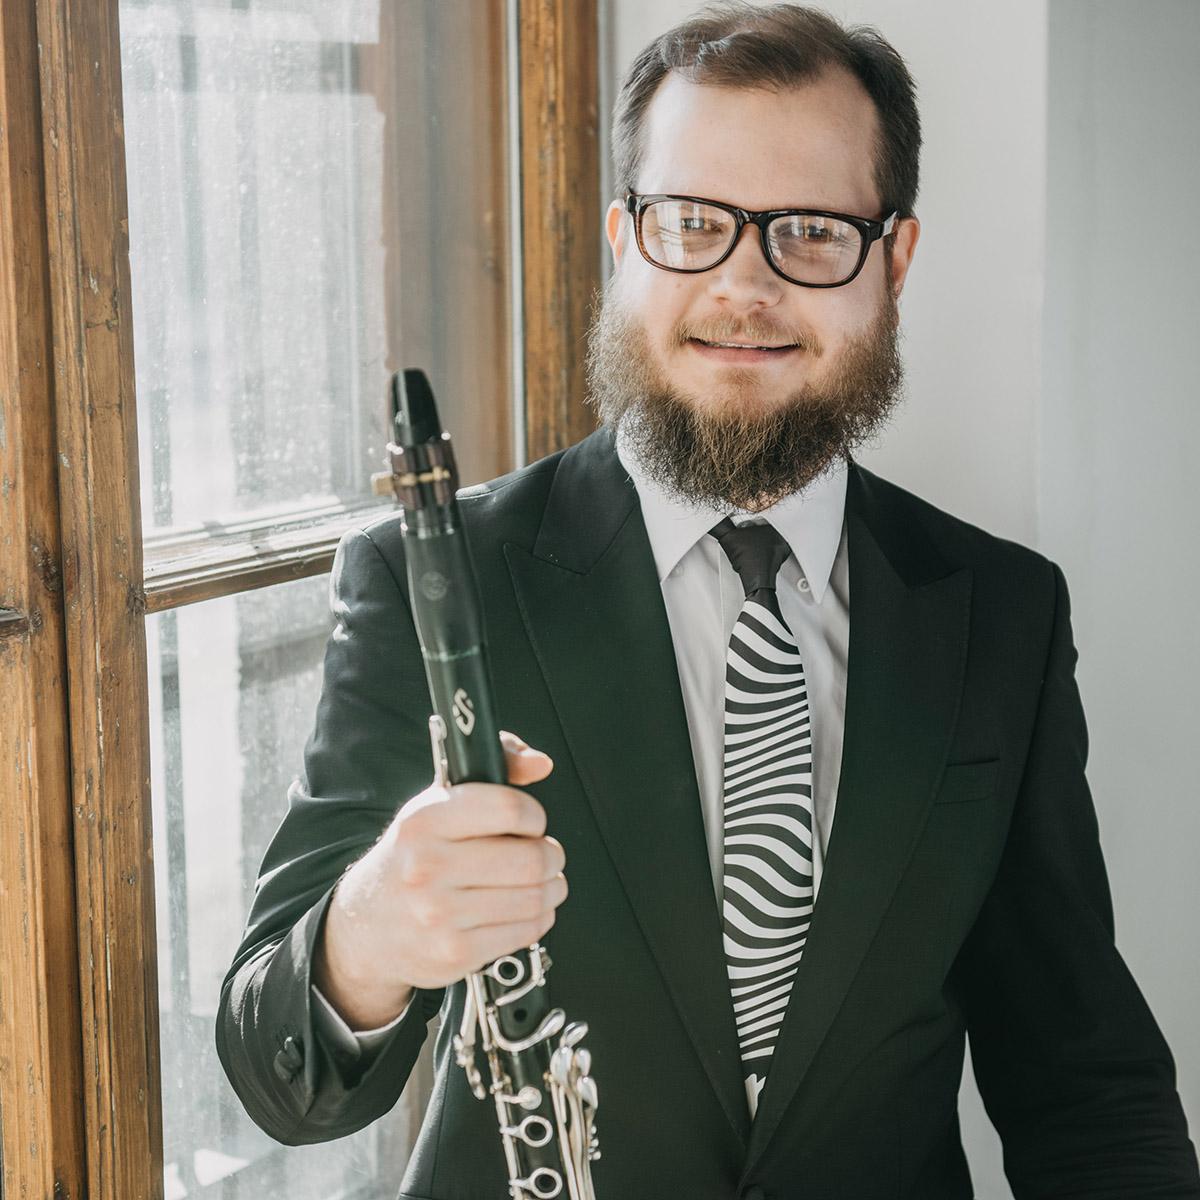 Jānis Tretjuks